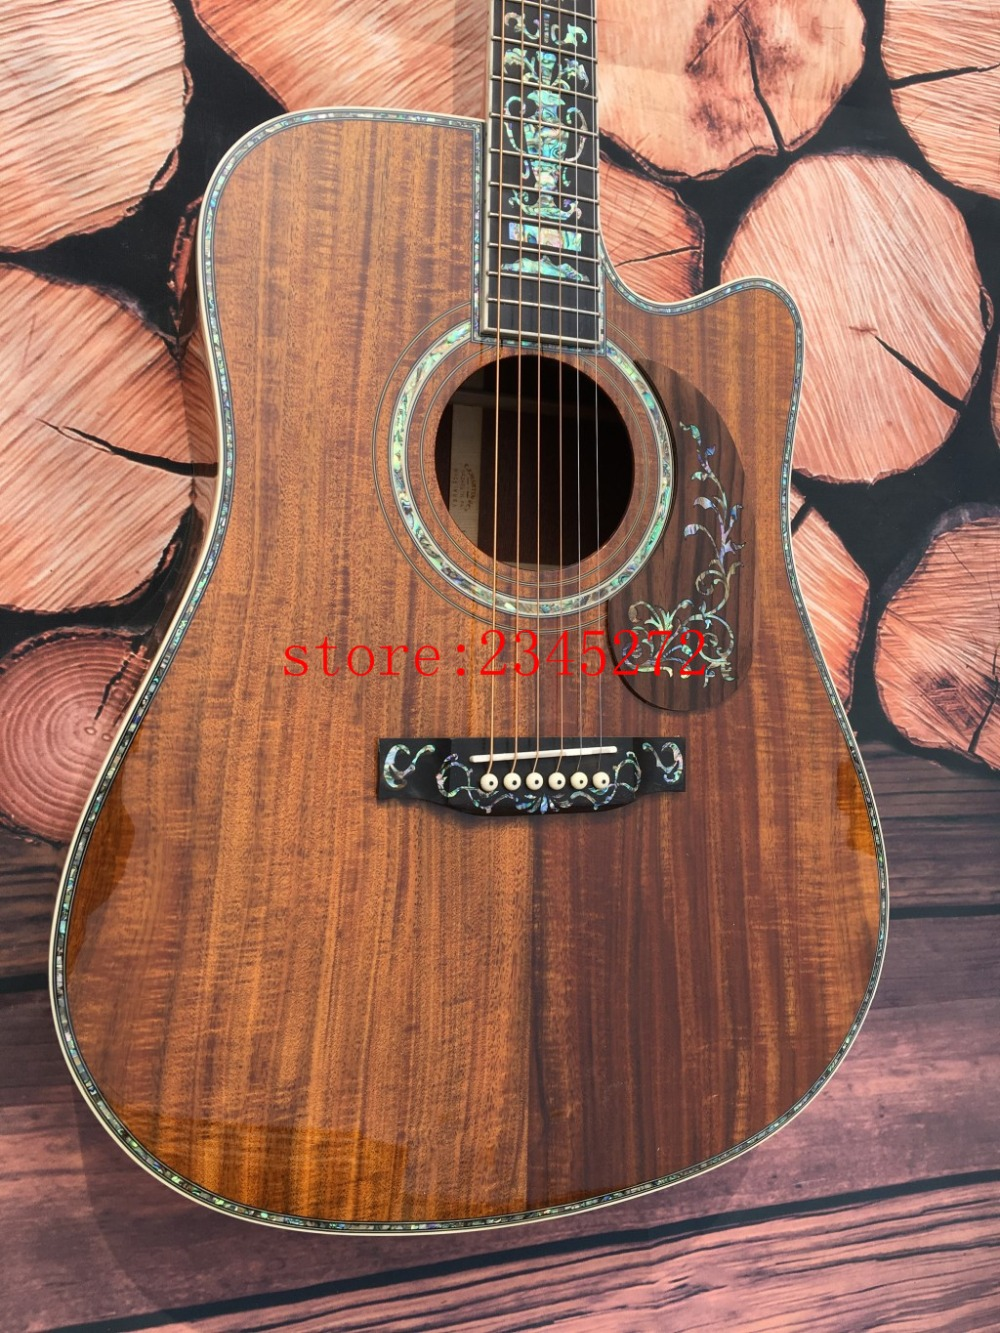 High quality OEM Cutaway koa acoustic acoustic guitar 41 inch ebony fingerboard real luxury abalone shell